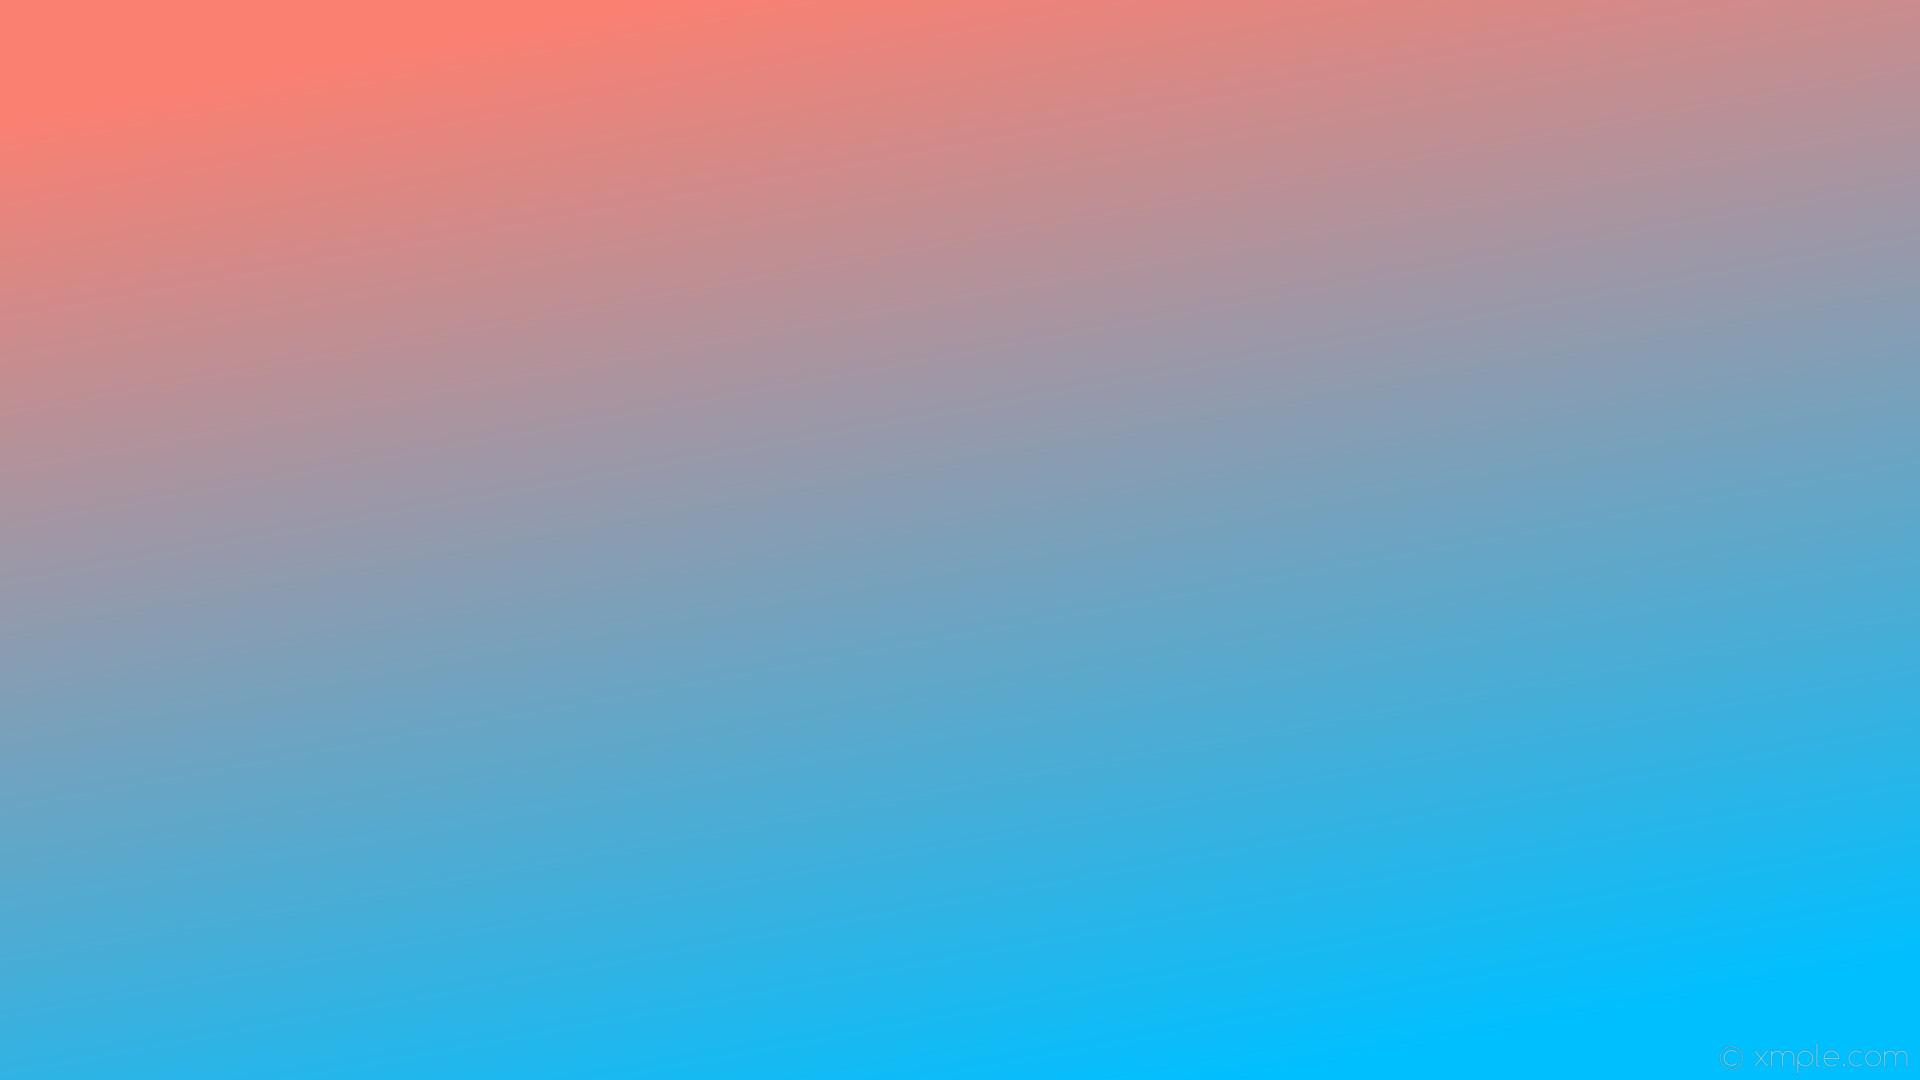 wallpaper red linear blue gradient salmon deep sky blue #fa8072 #00bfff 120°